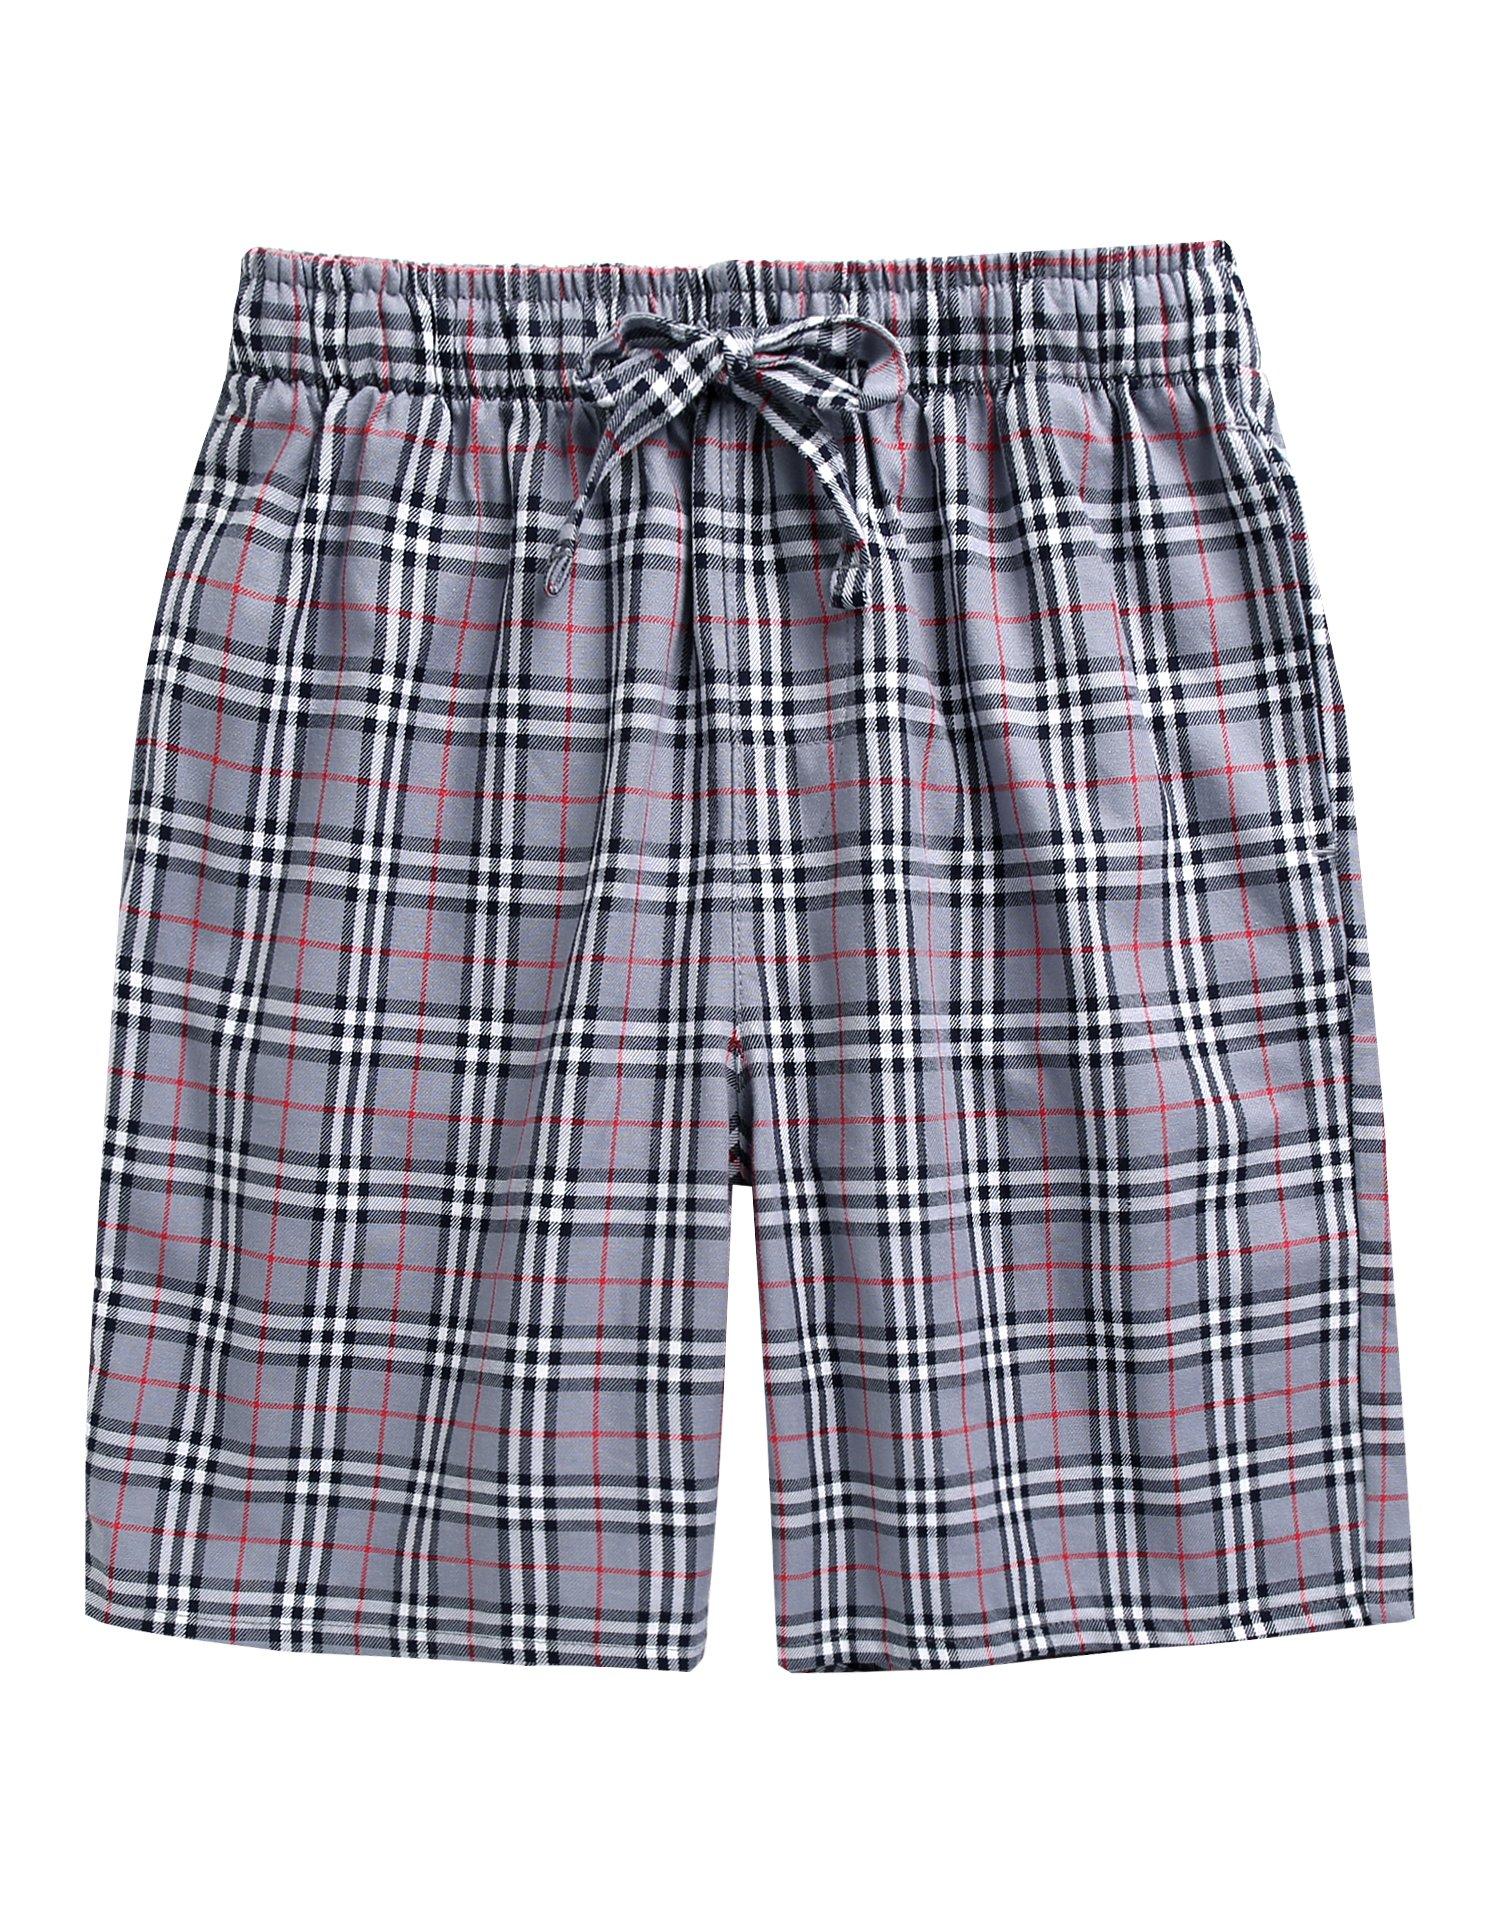 TINFL Men's Plaid Check Cotton Lounge Sleep Shorts MSP-SB001-Grey L